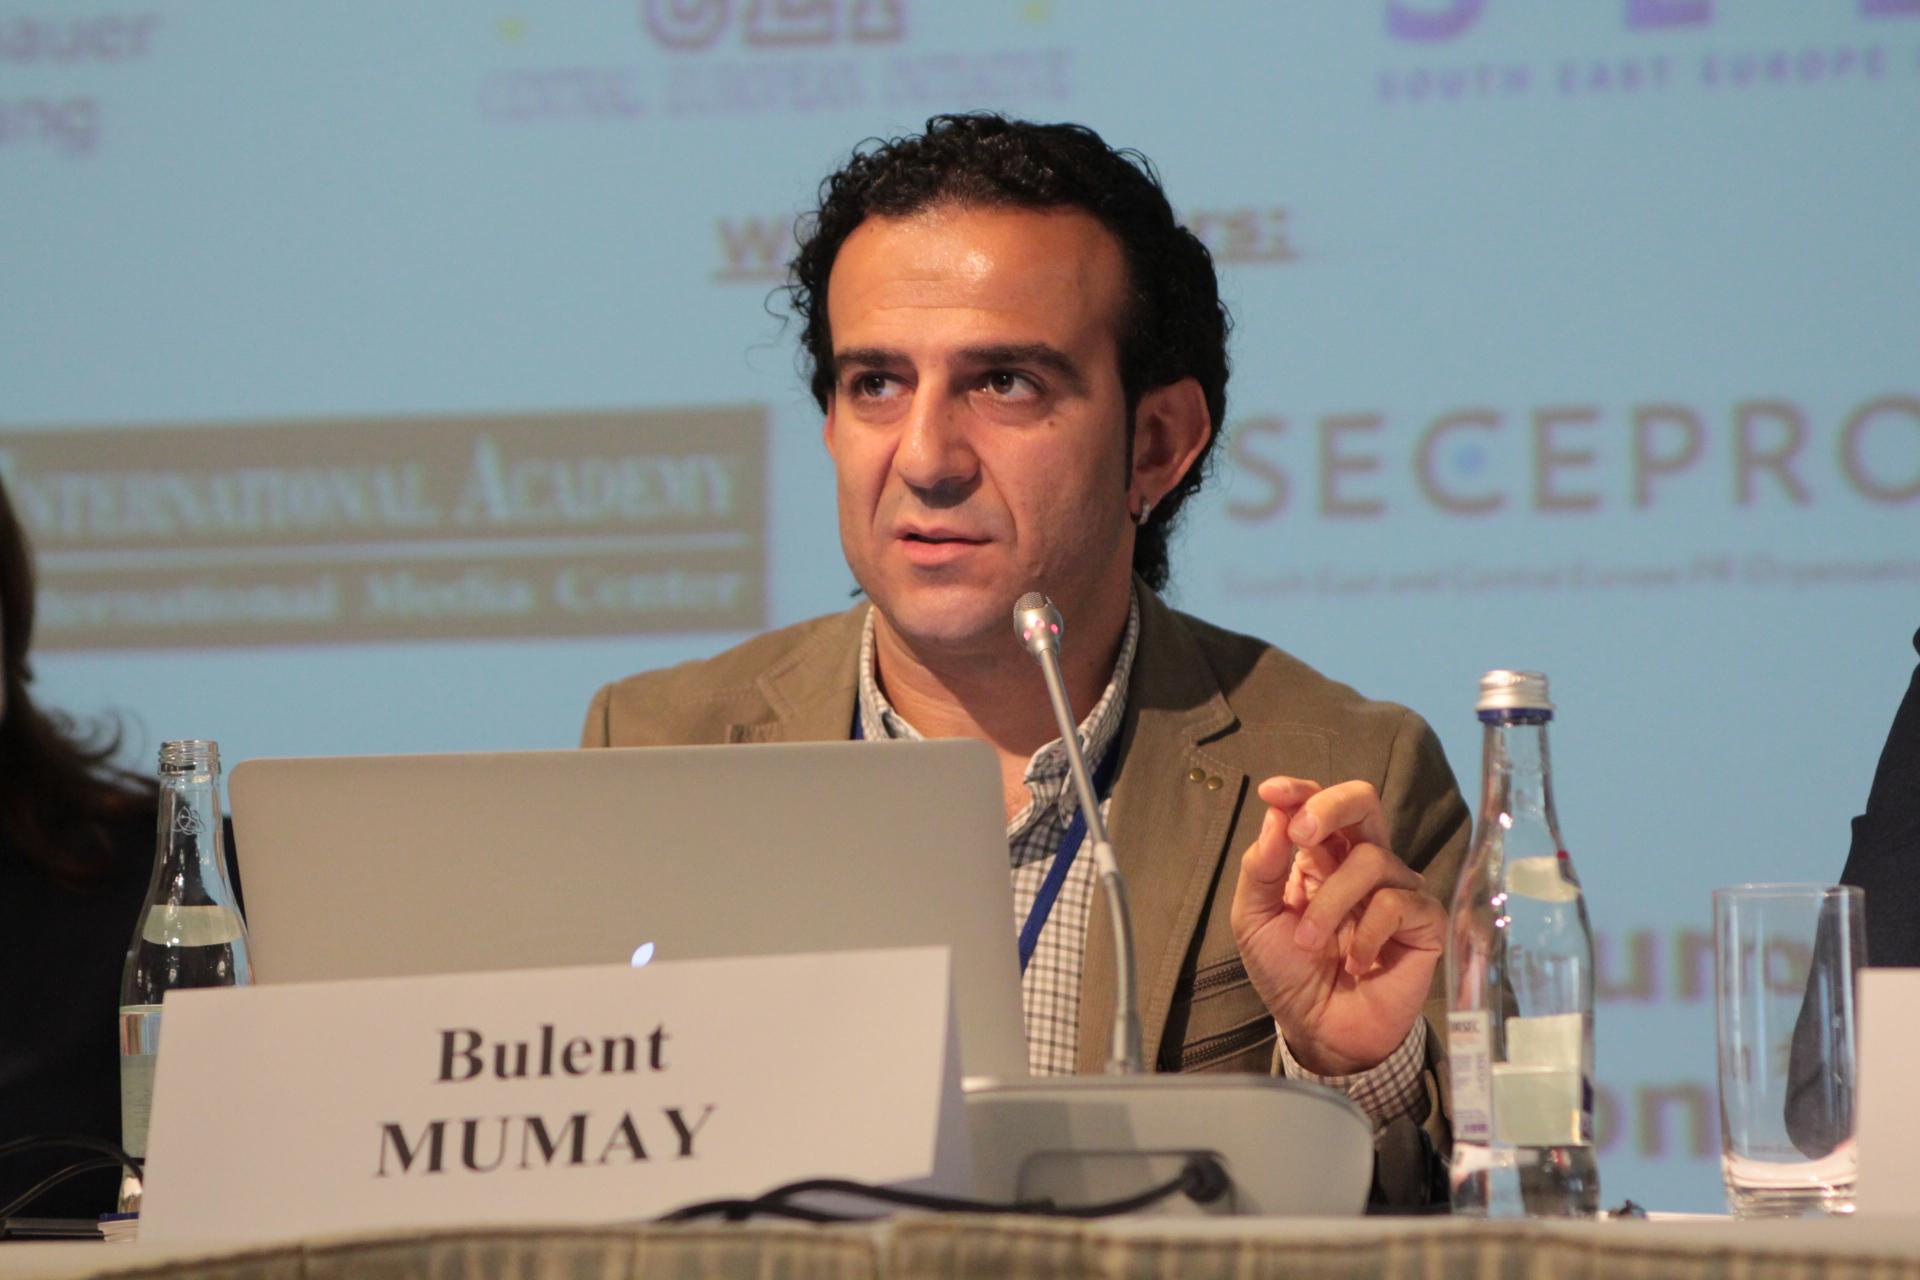 Bülent Mumay durante il SEEMO Forum di Bucarest (novembre 2015)